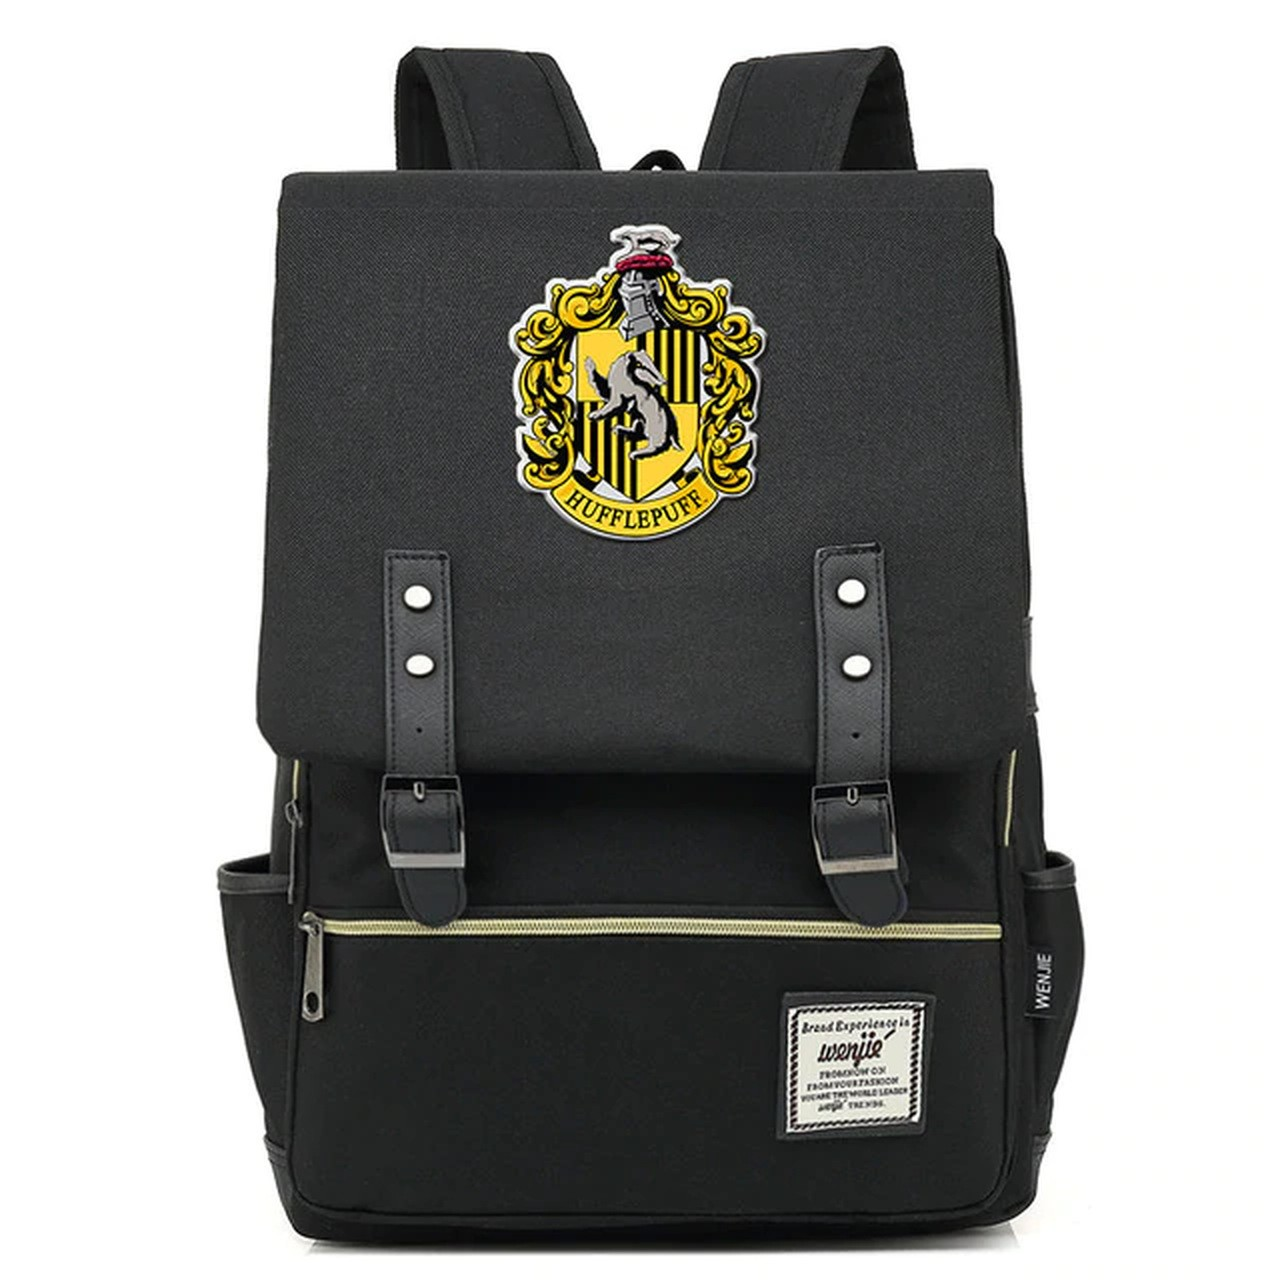 Mochila Hogwarts Casa Lufa-Lufa: Harry Potter (Preto)